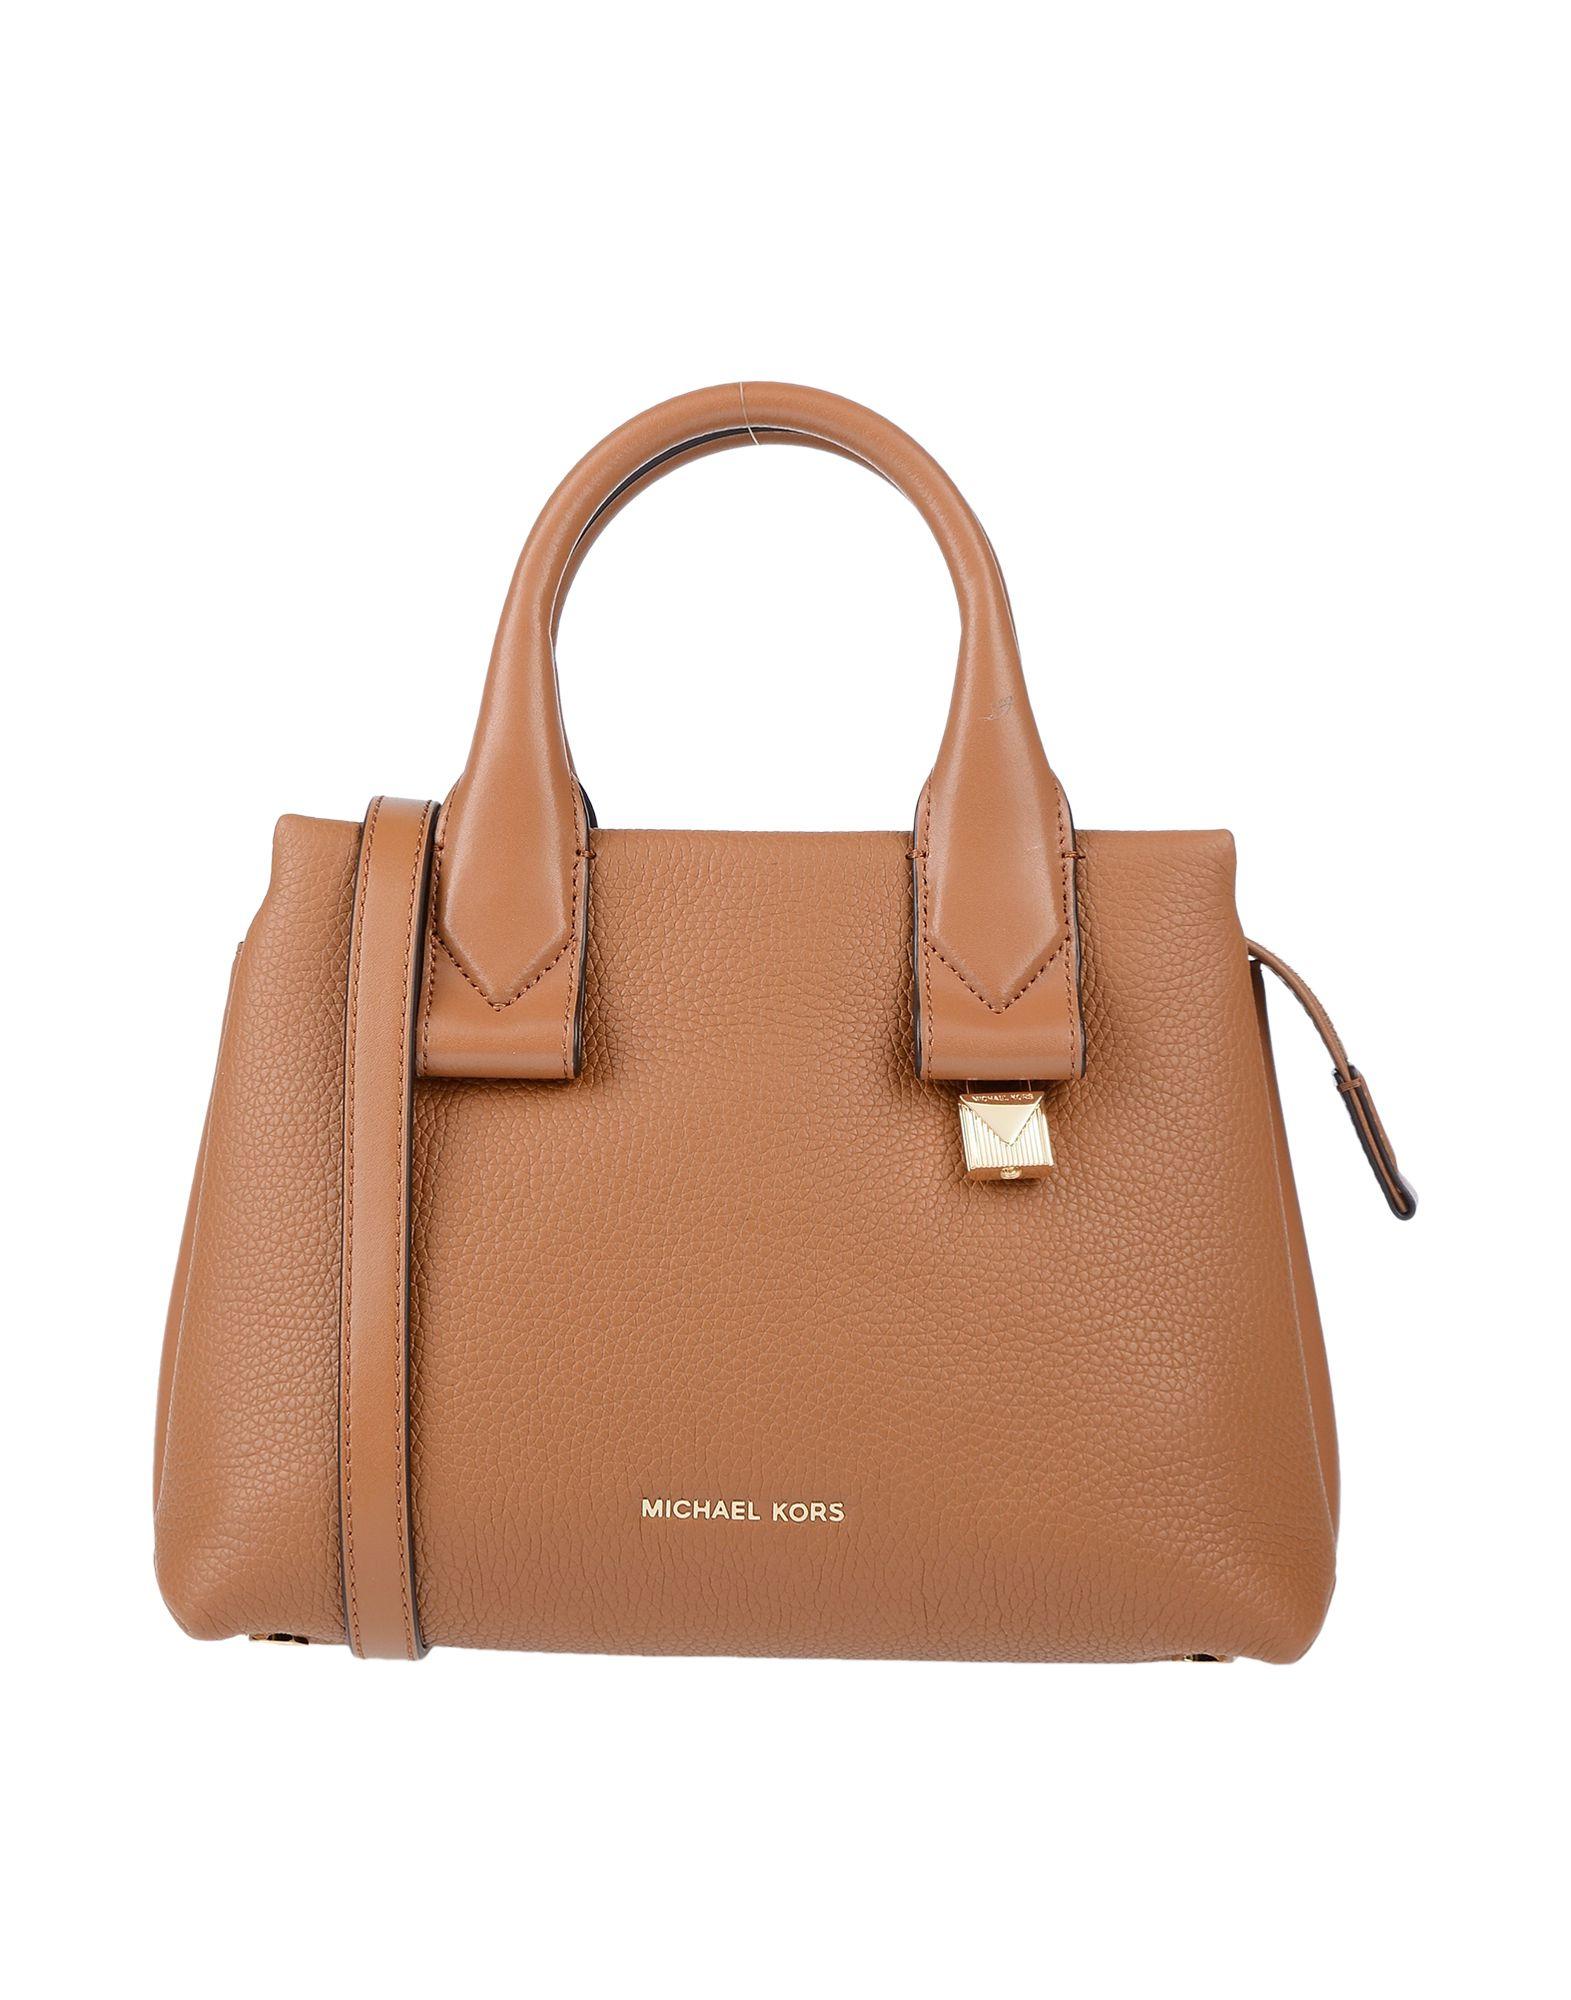 678df3af50166 Michael Kors Handbag - Women Michael Kors Handbags online on YOOX ...